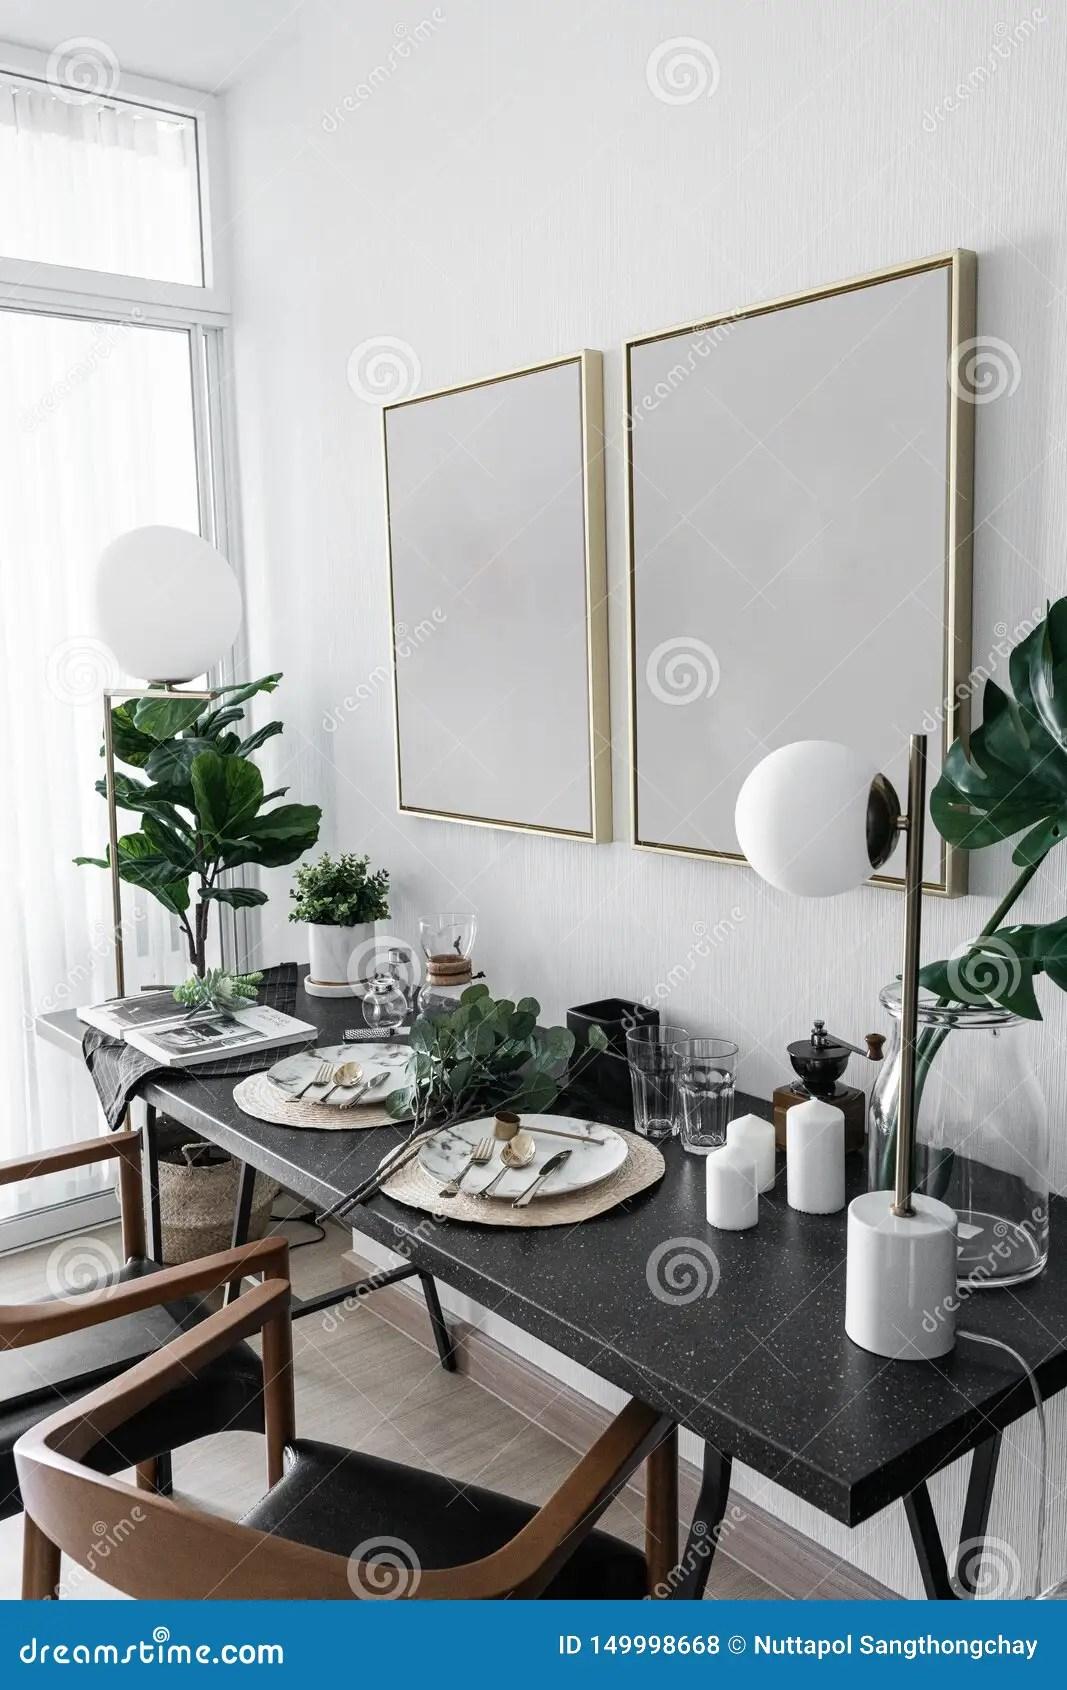 Cozy Dining Corner With Nice Decoration In Scandinavian